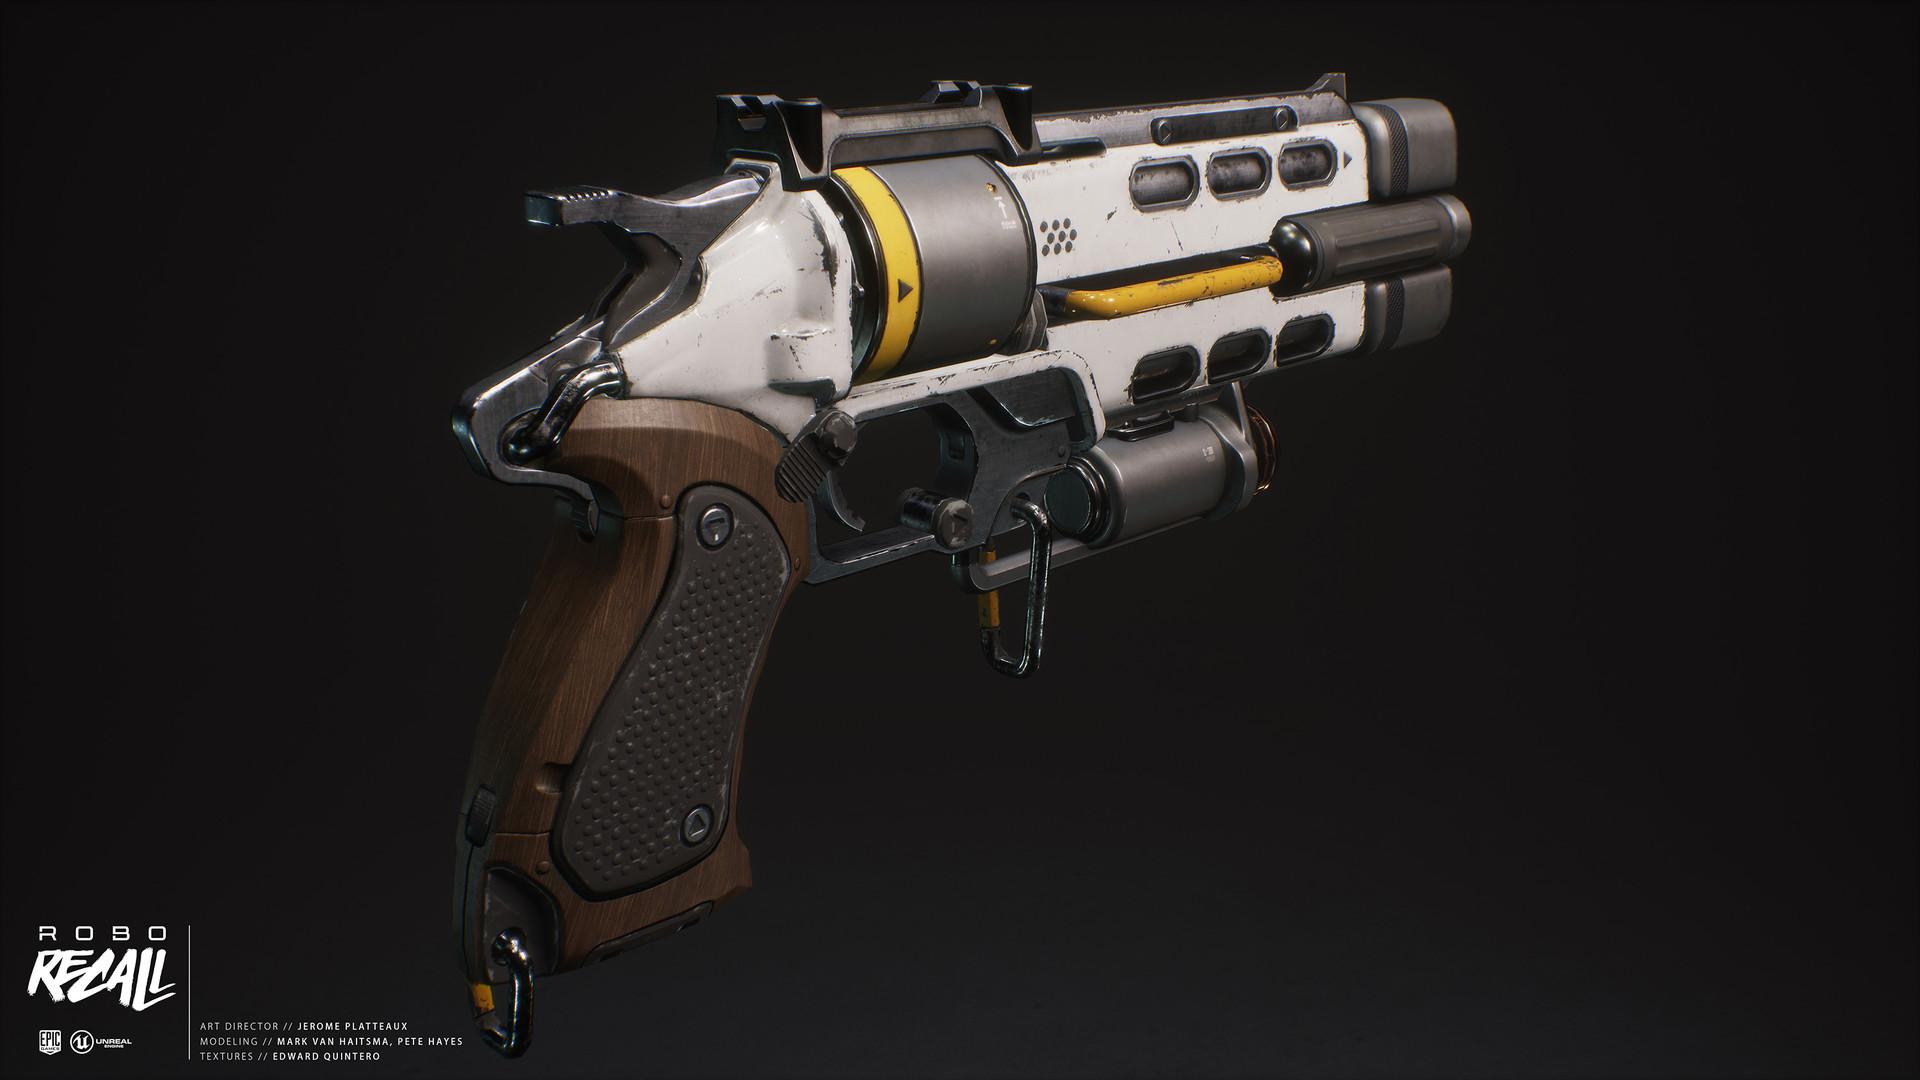 Mark van haitsma revolver 02